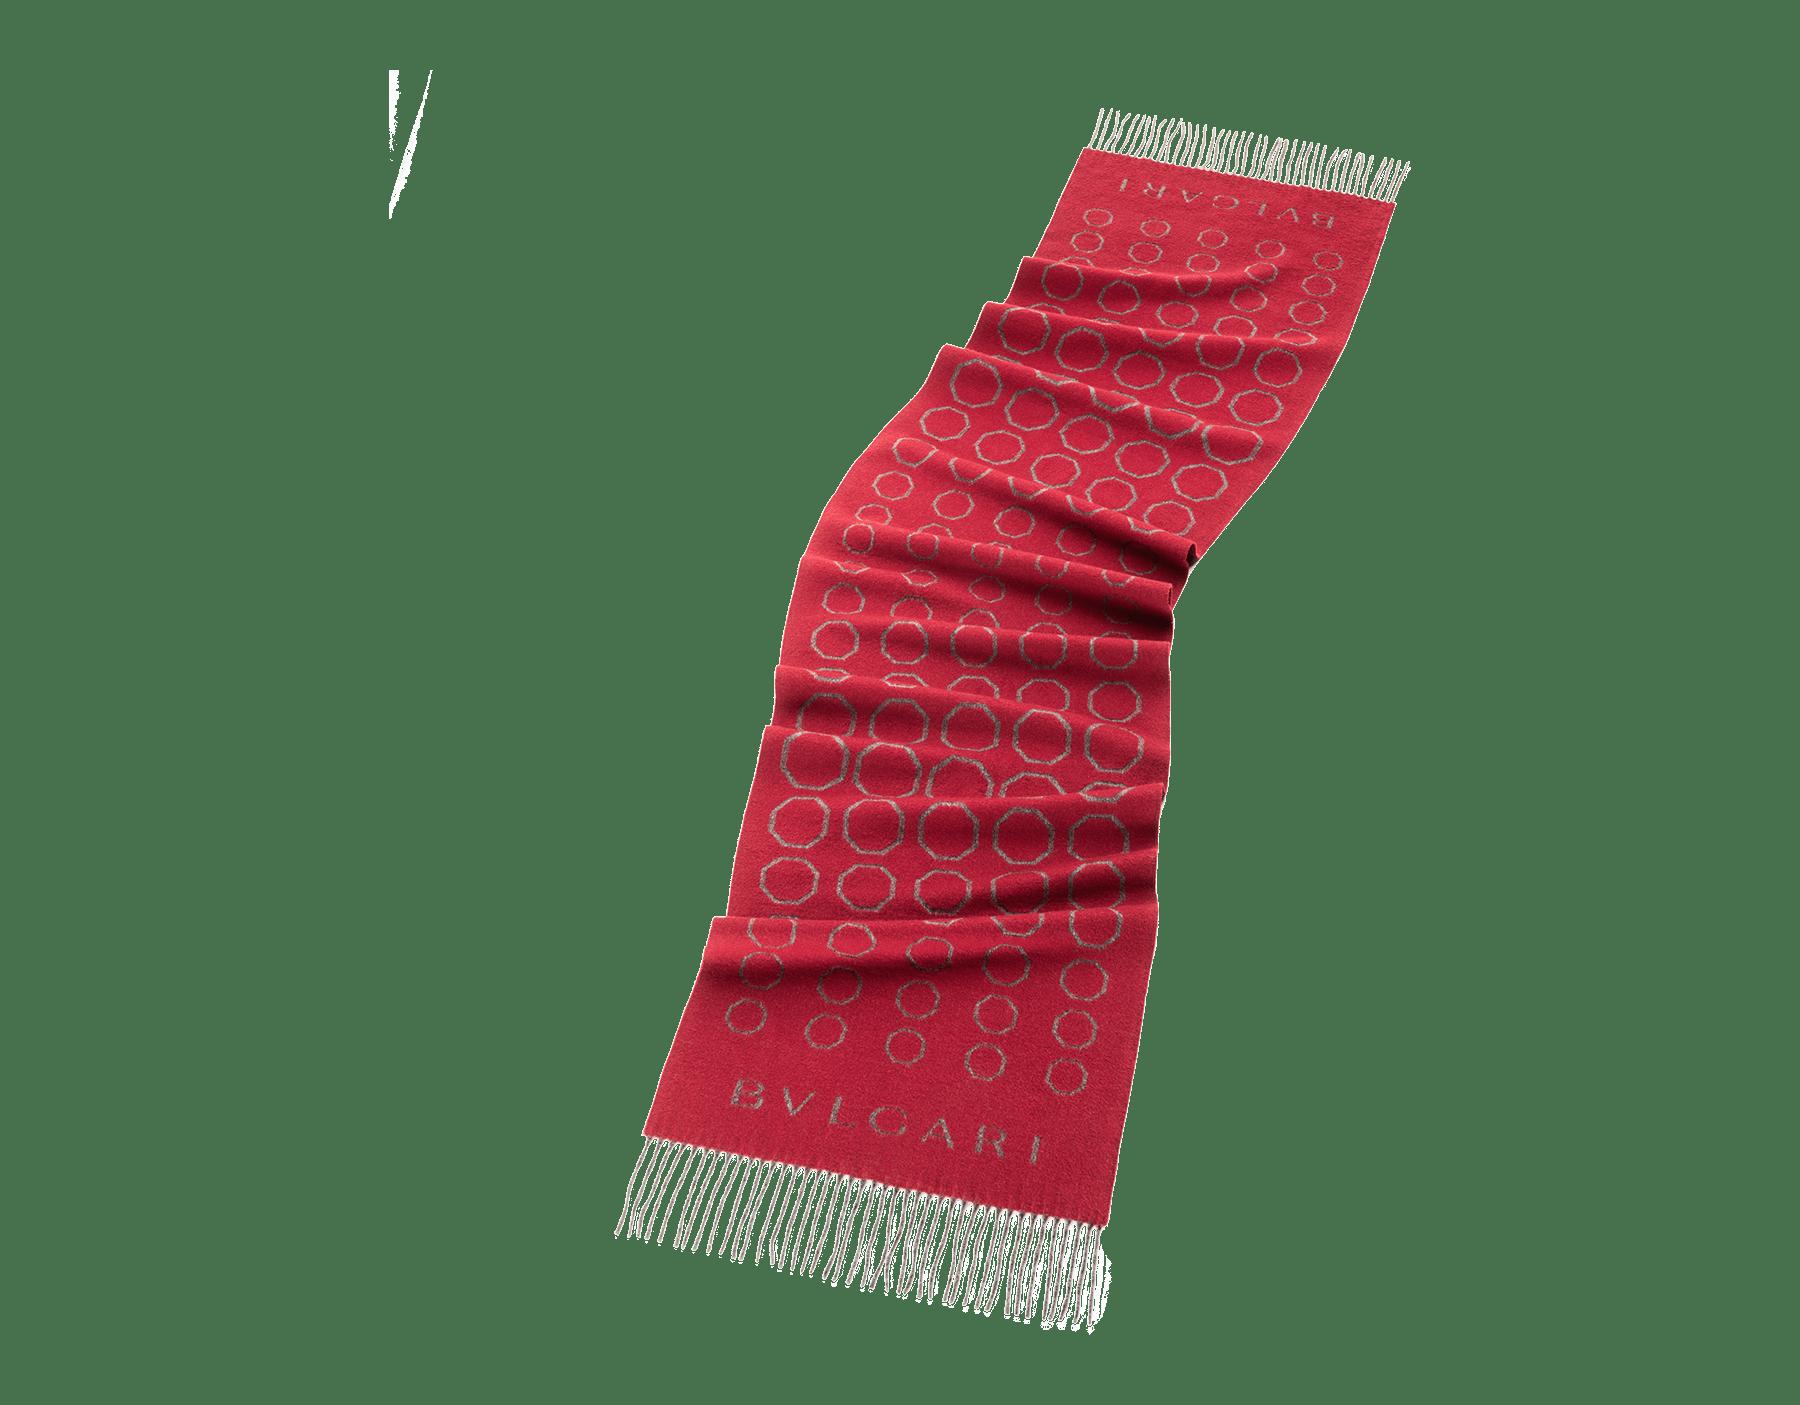 Estola Octo Degradé granada romana em fina lã. 243839 image 1